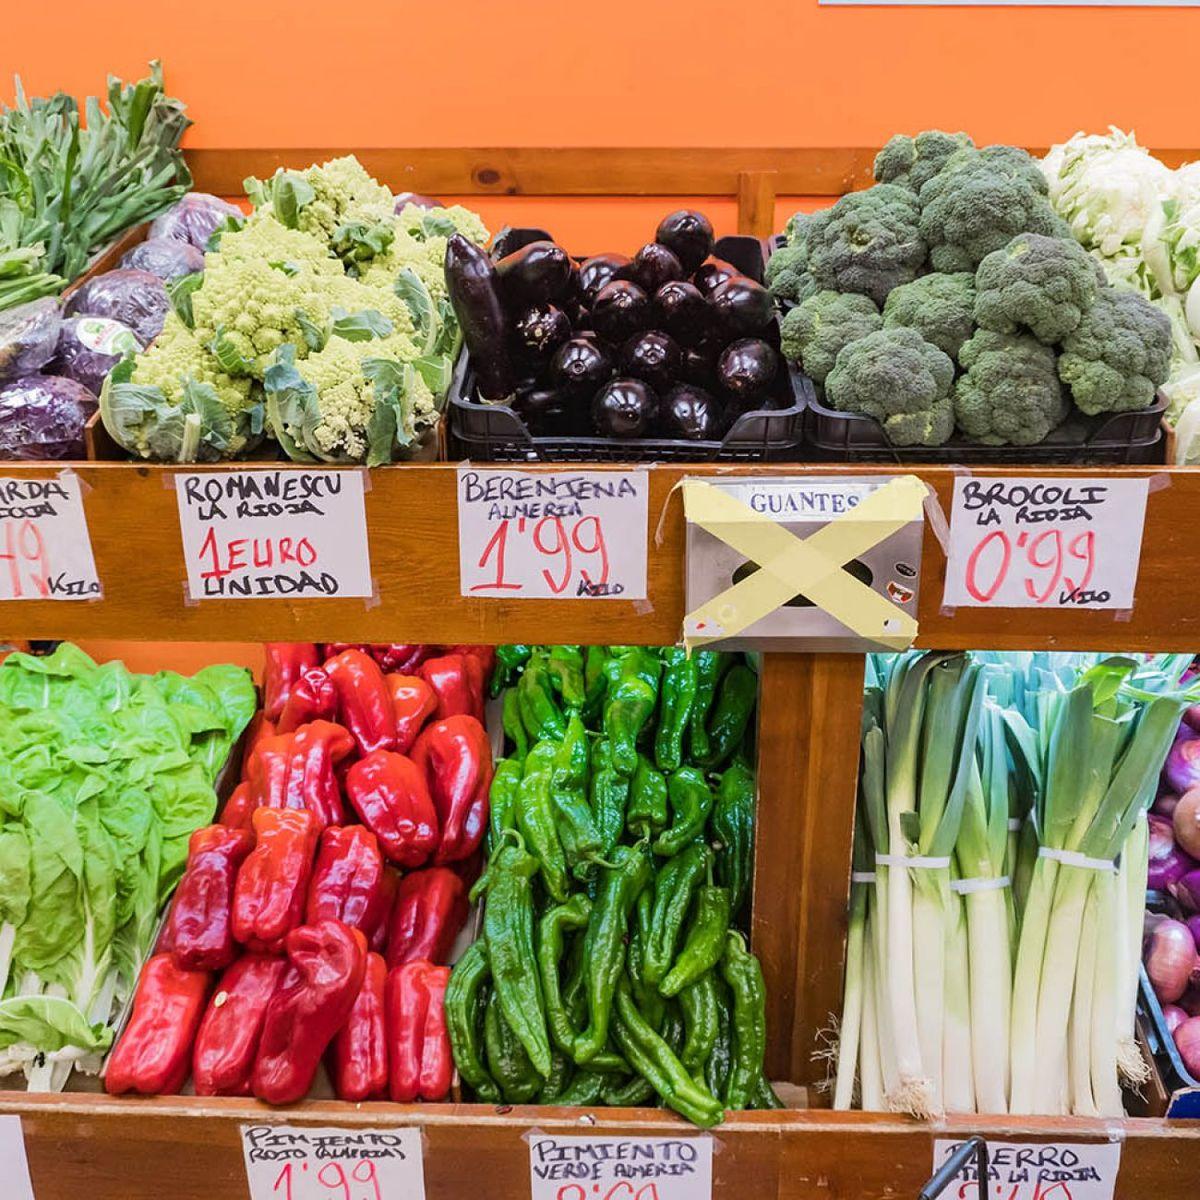 Frutas y verduras Landako, en Deusto